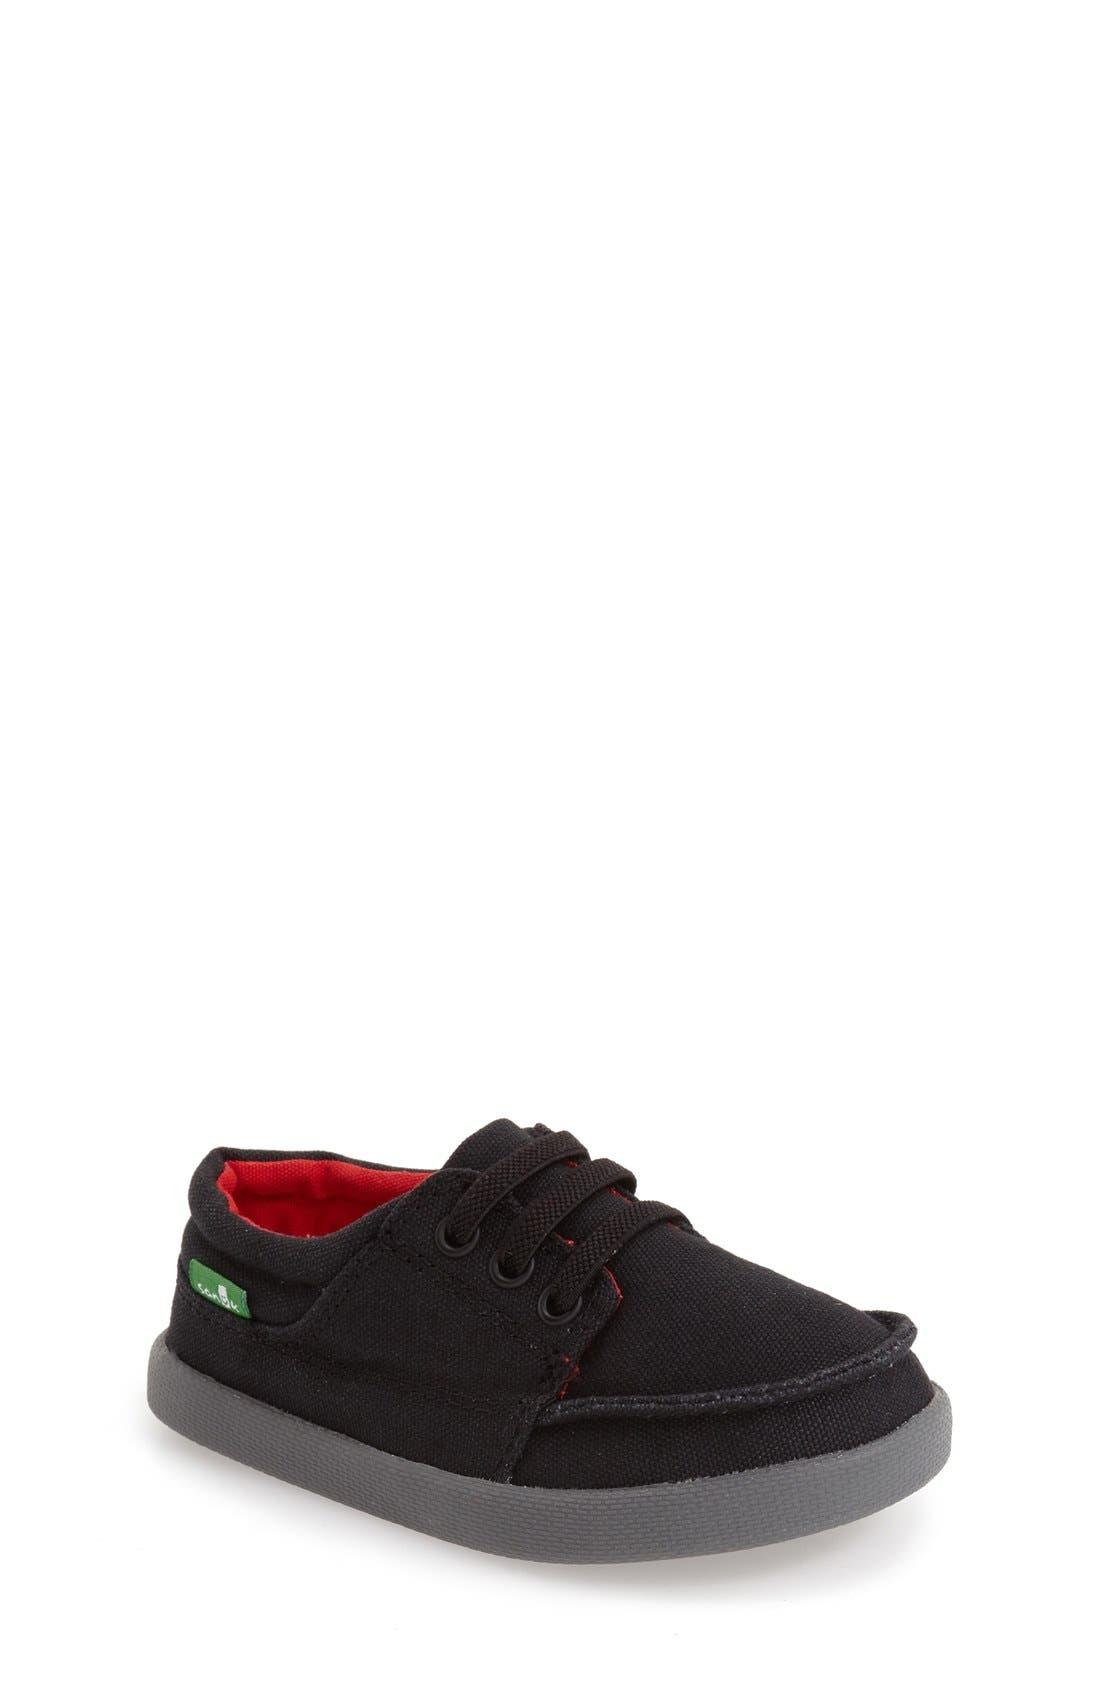 'Lil Tko' Sneaker,                         Main,                         color, Black